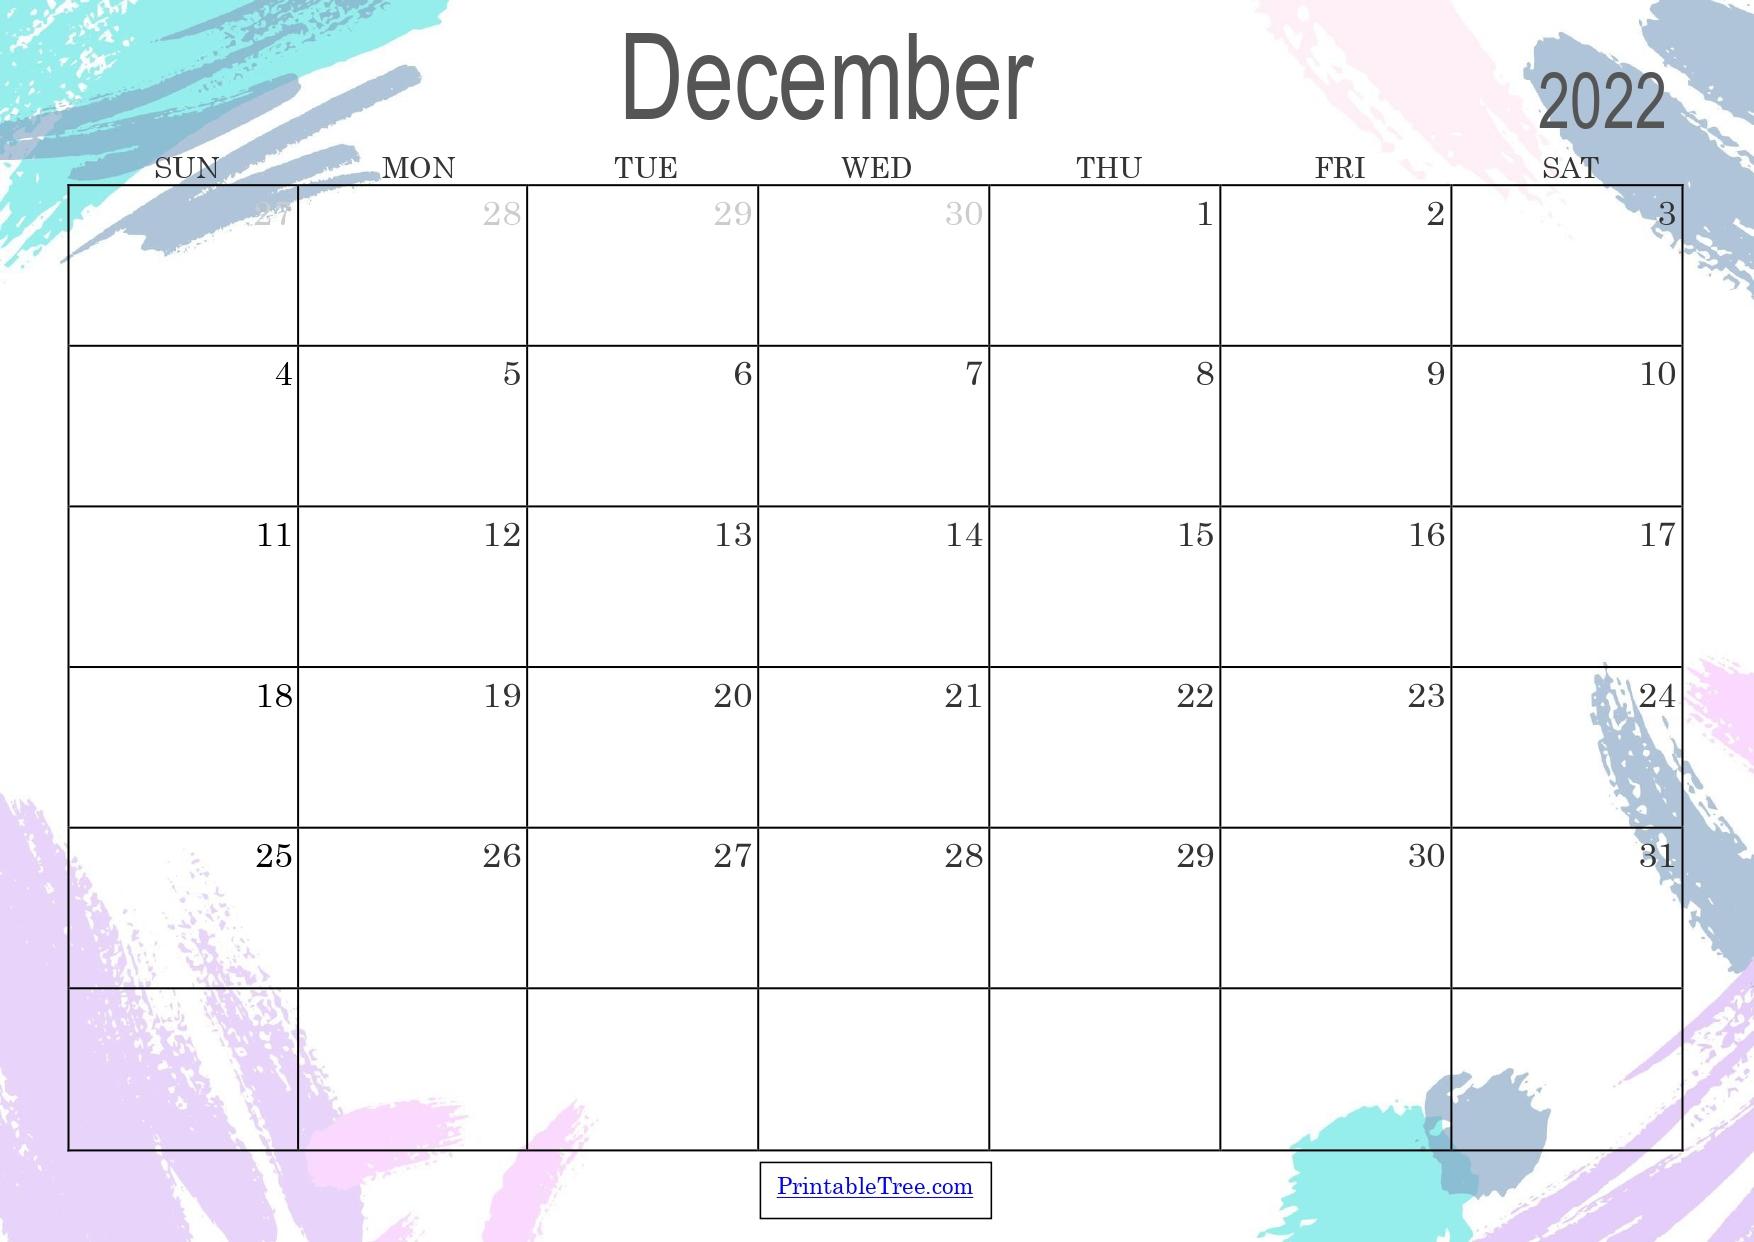 Colored Monthly Calendar December 2022